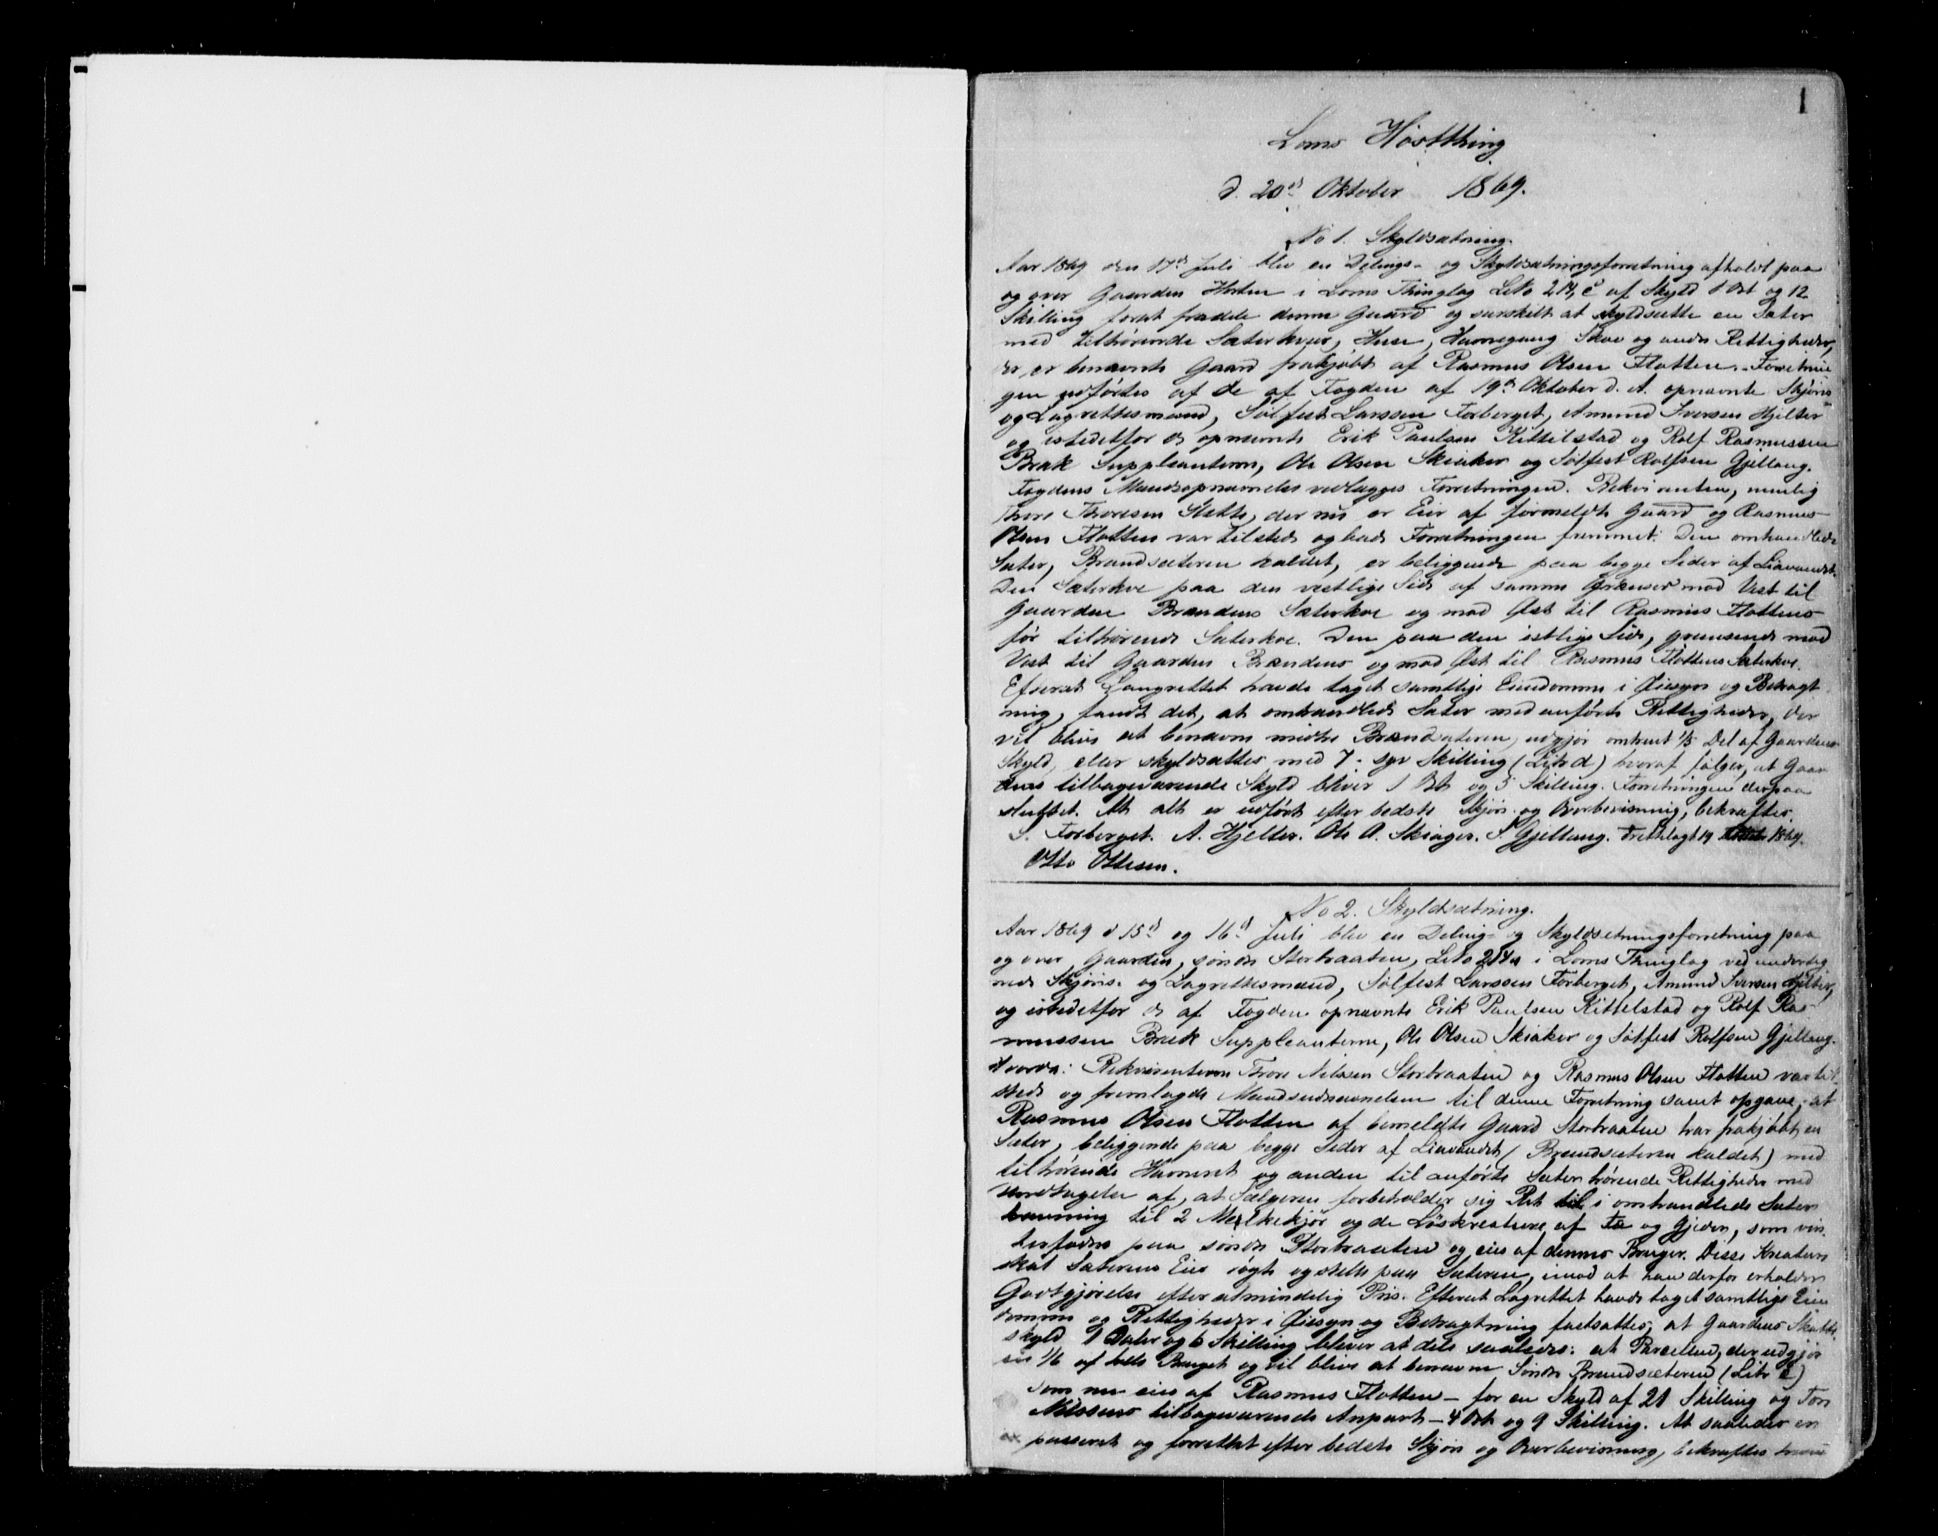 SAH, Nord-Gudbrandsdal tingrett, H/Hb/Hba/L0010A: Pantebok nr. 10a, 1869-1876, s. 0-1